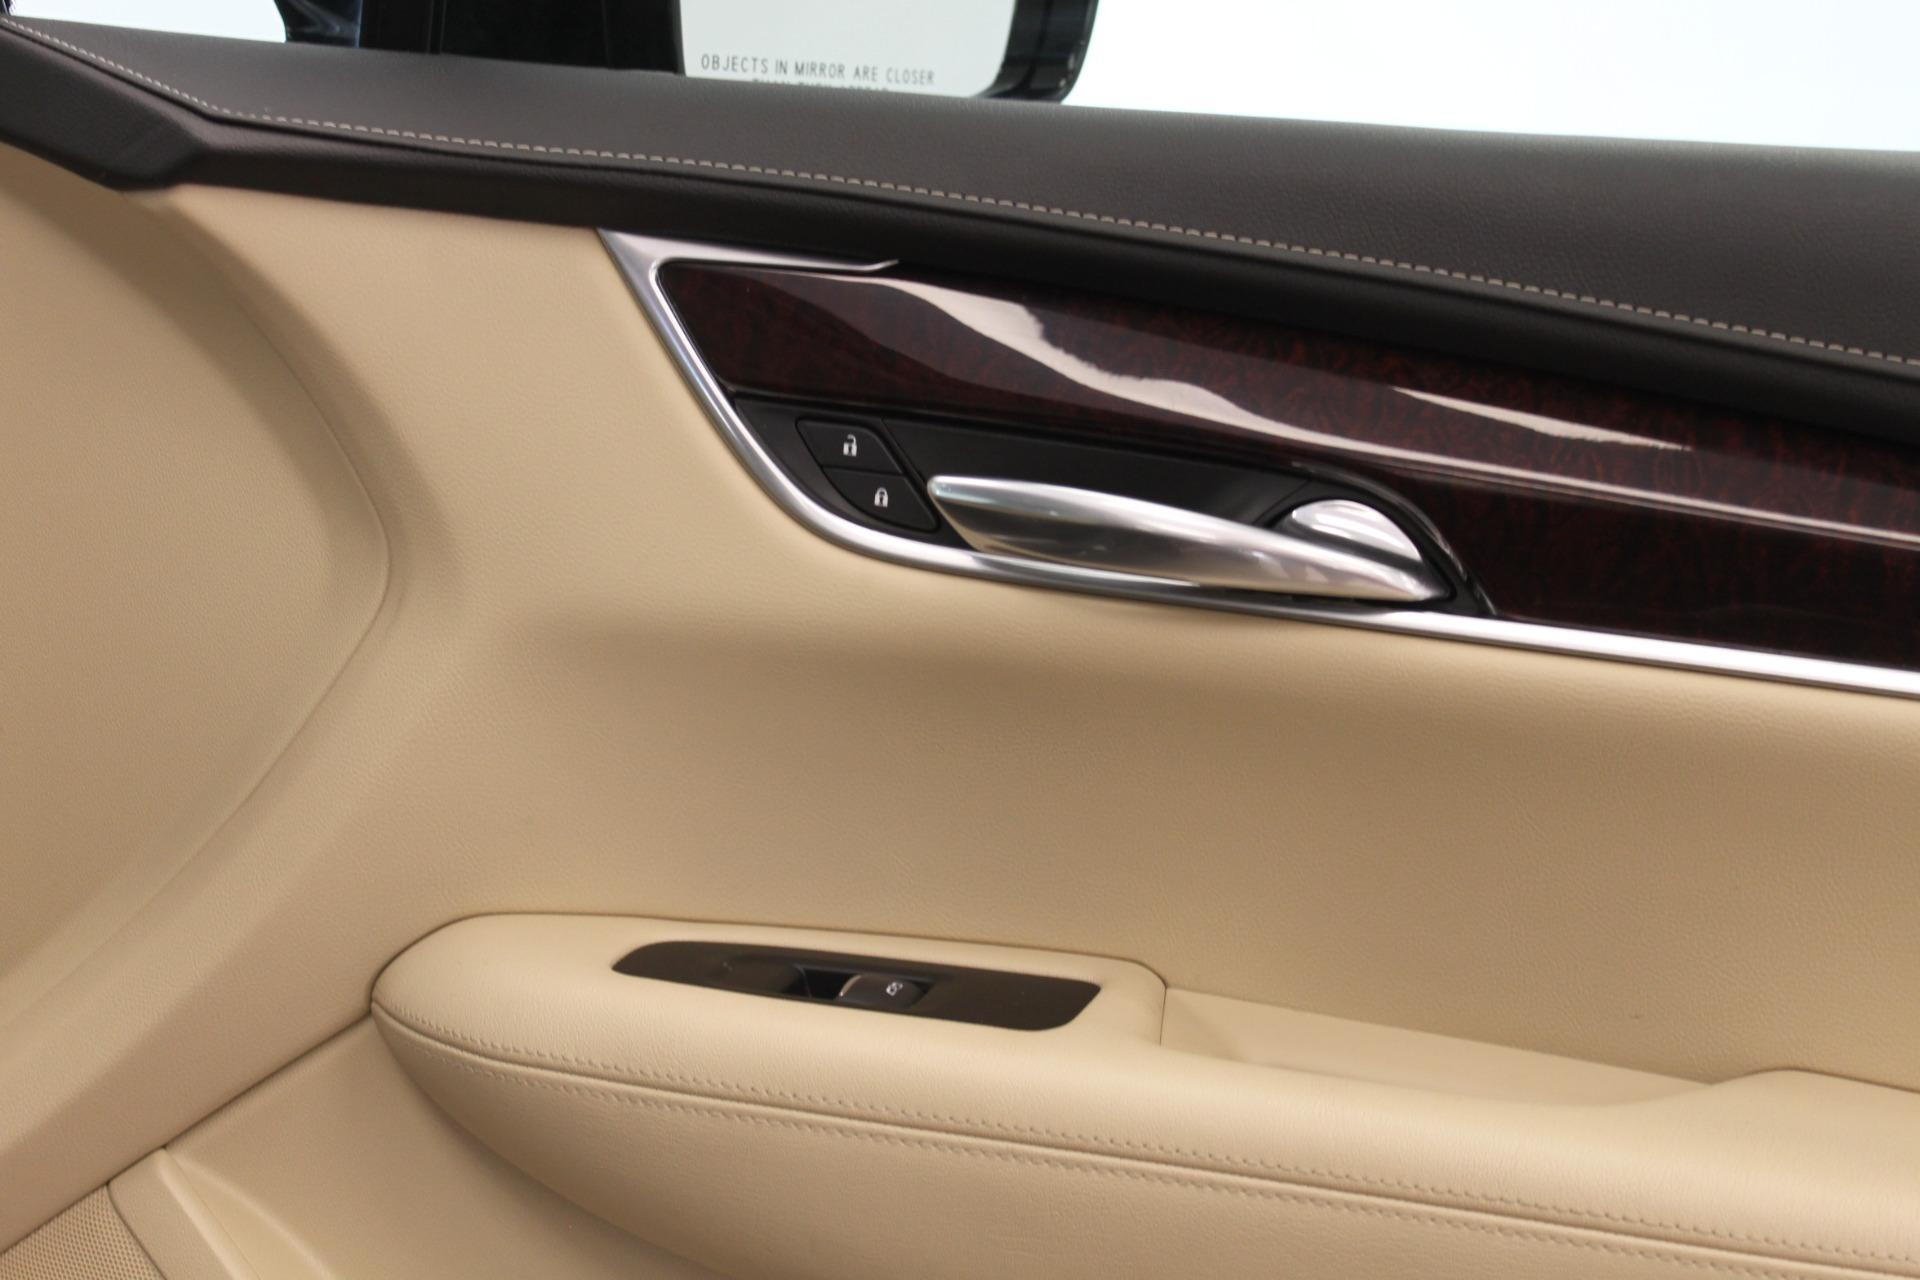 Used-2017-Cadillac-XT5-Luxury-All-Wheel-Drive-Luxury-AWD-Camaro